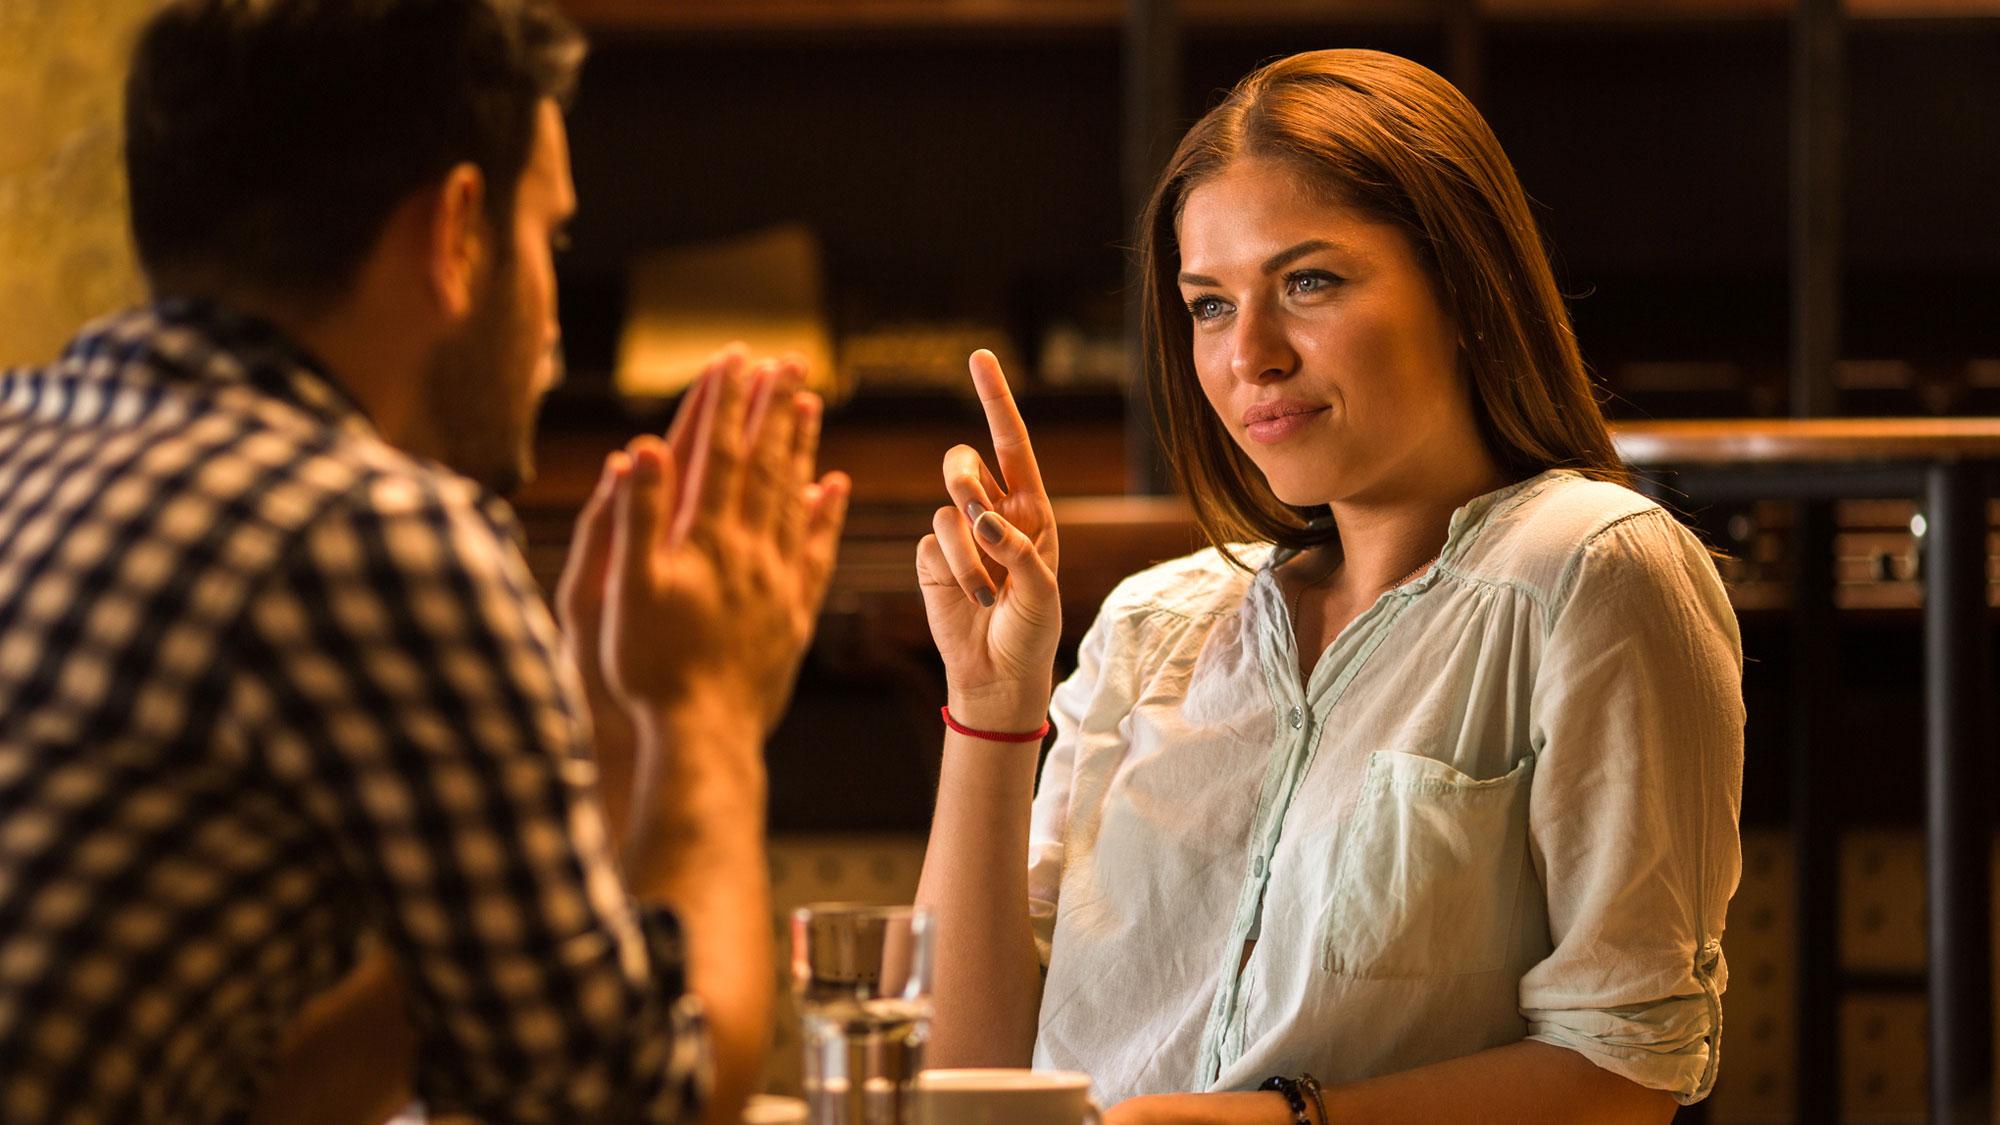 How to Handle Relationship Deal Breakers